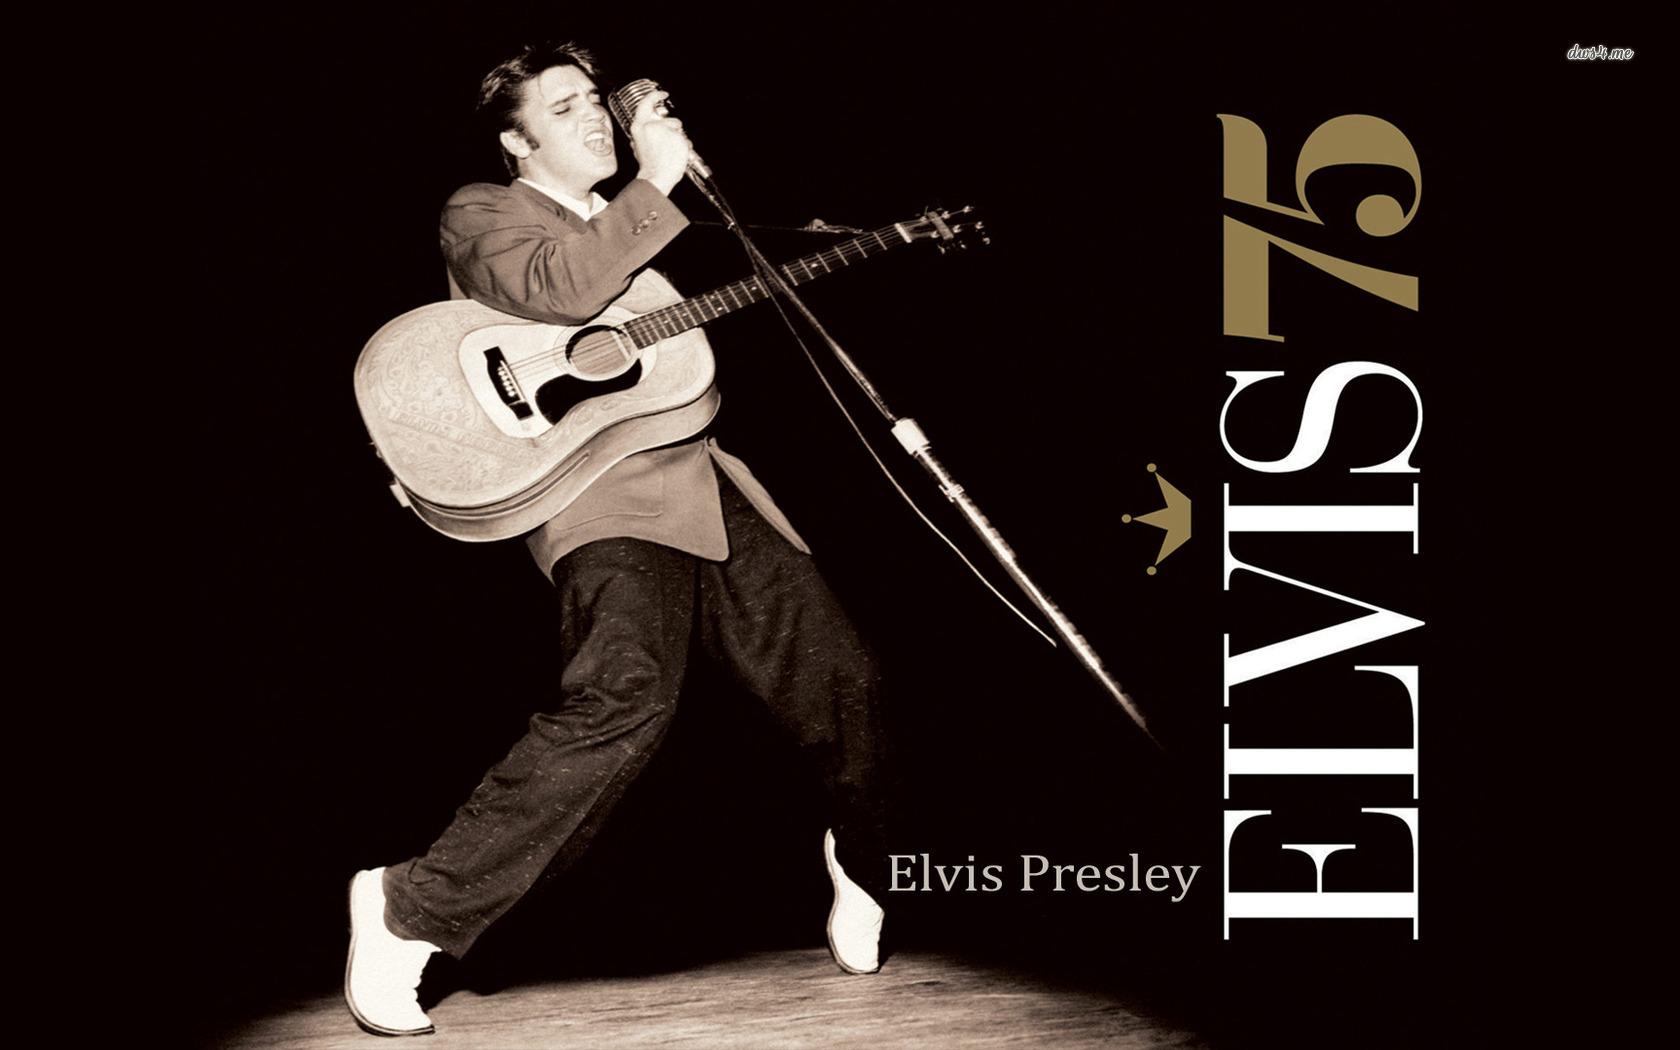 Elvis Presley Wallpaper 1680x1050 Free - WallpaperSafari